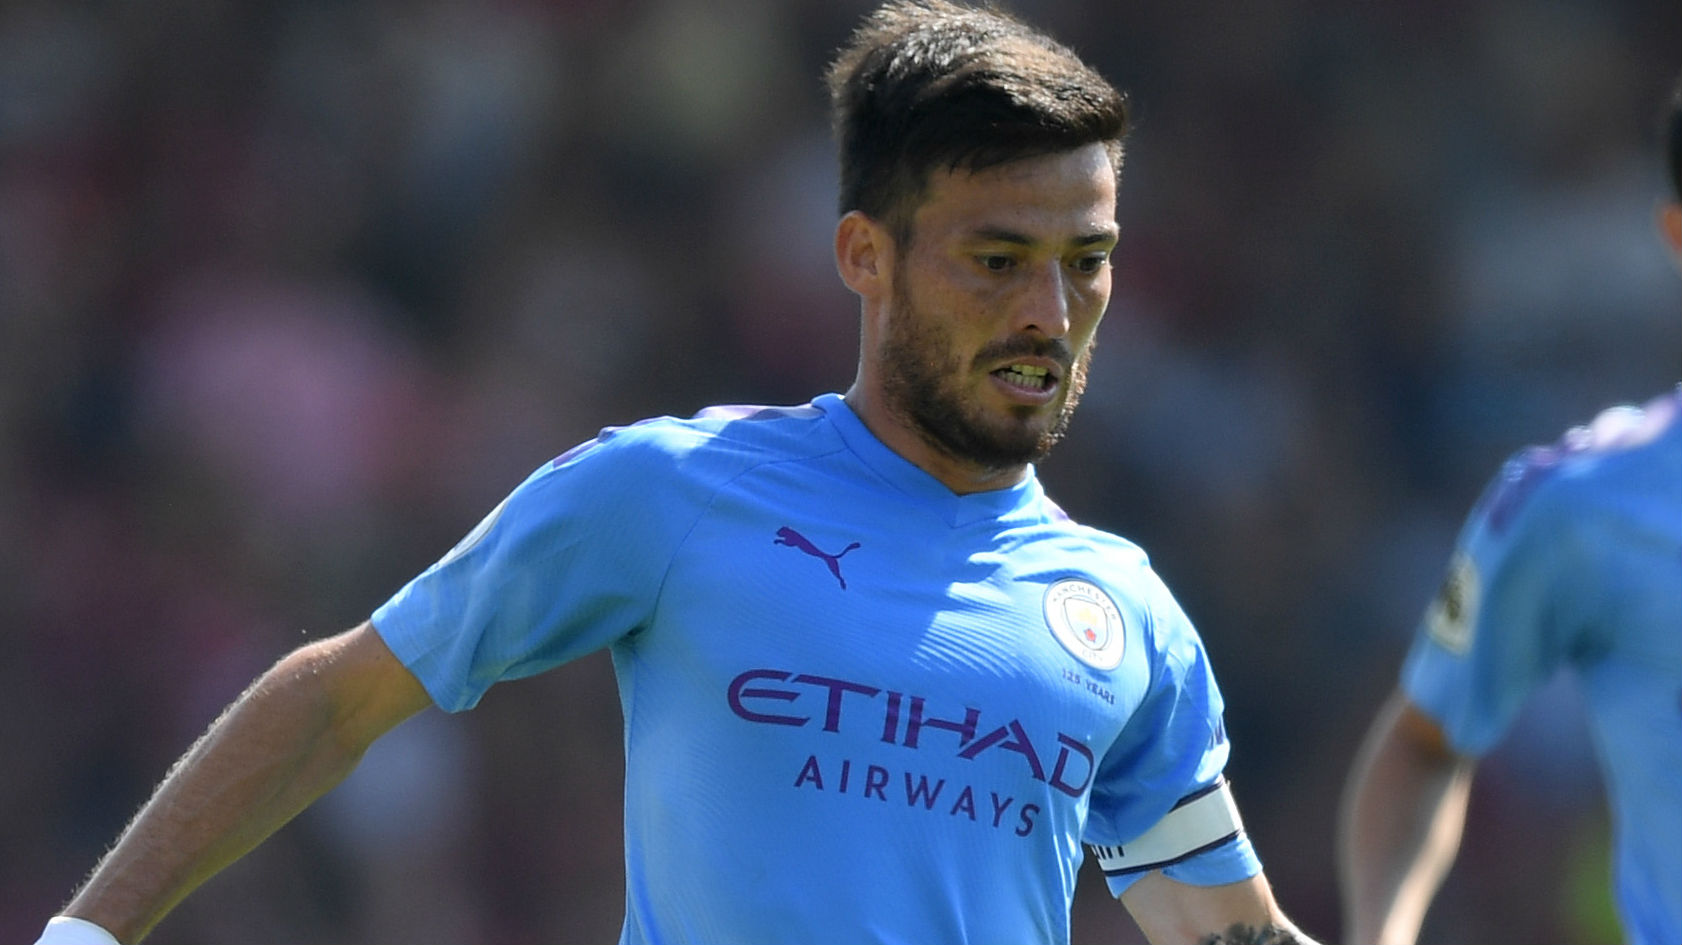 Everton 1 Man City 3: Premier League Record For David